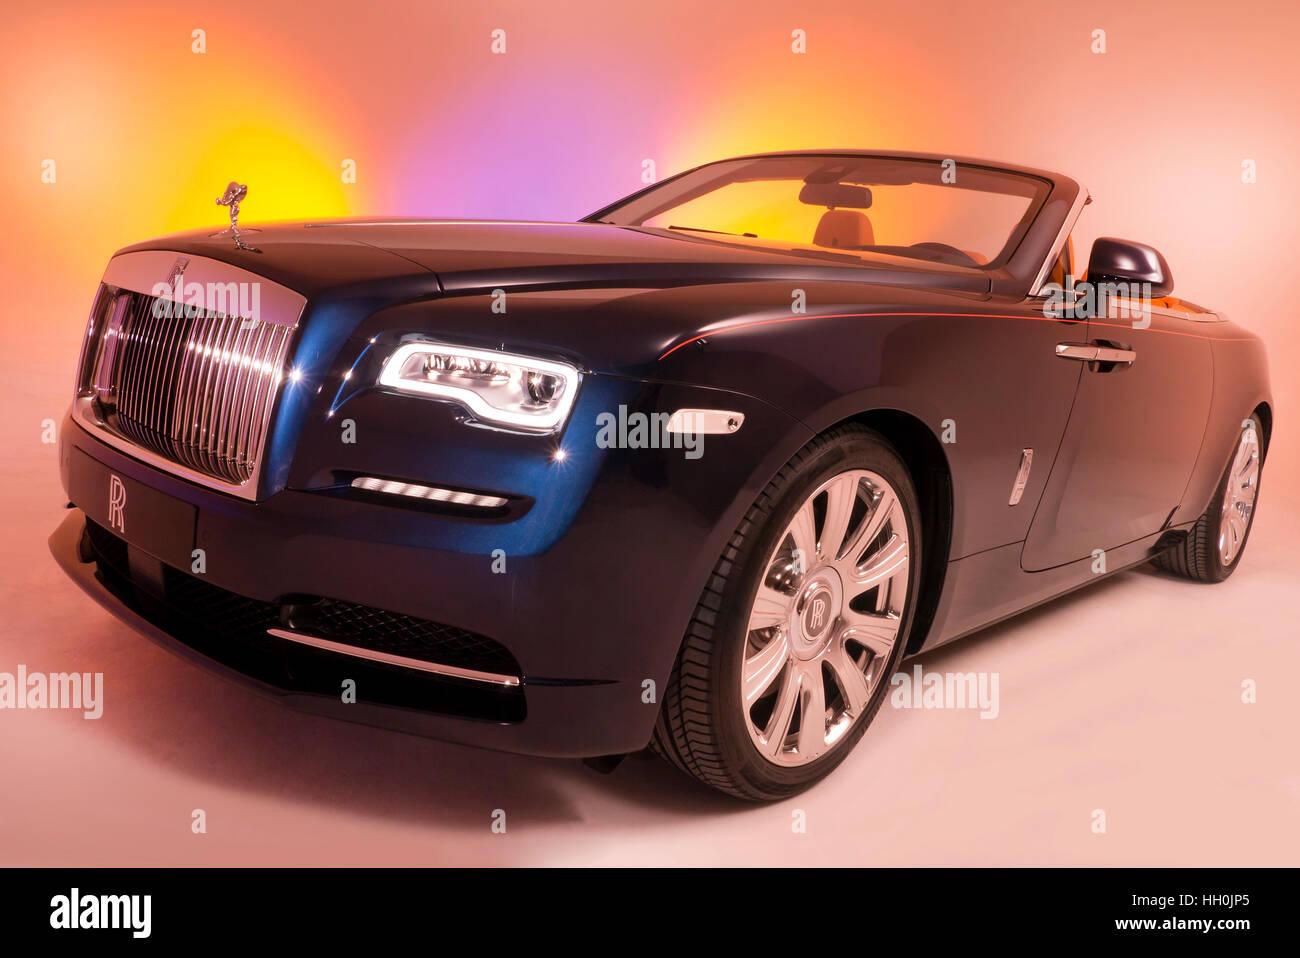 Rolls Royce Silver Dawn 2015 - Stock Image